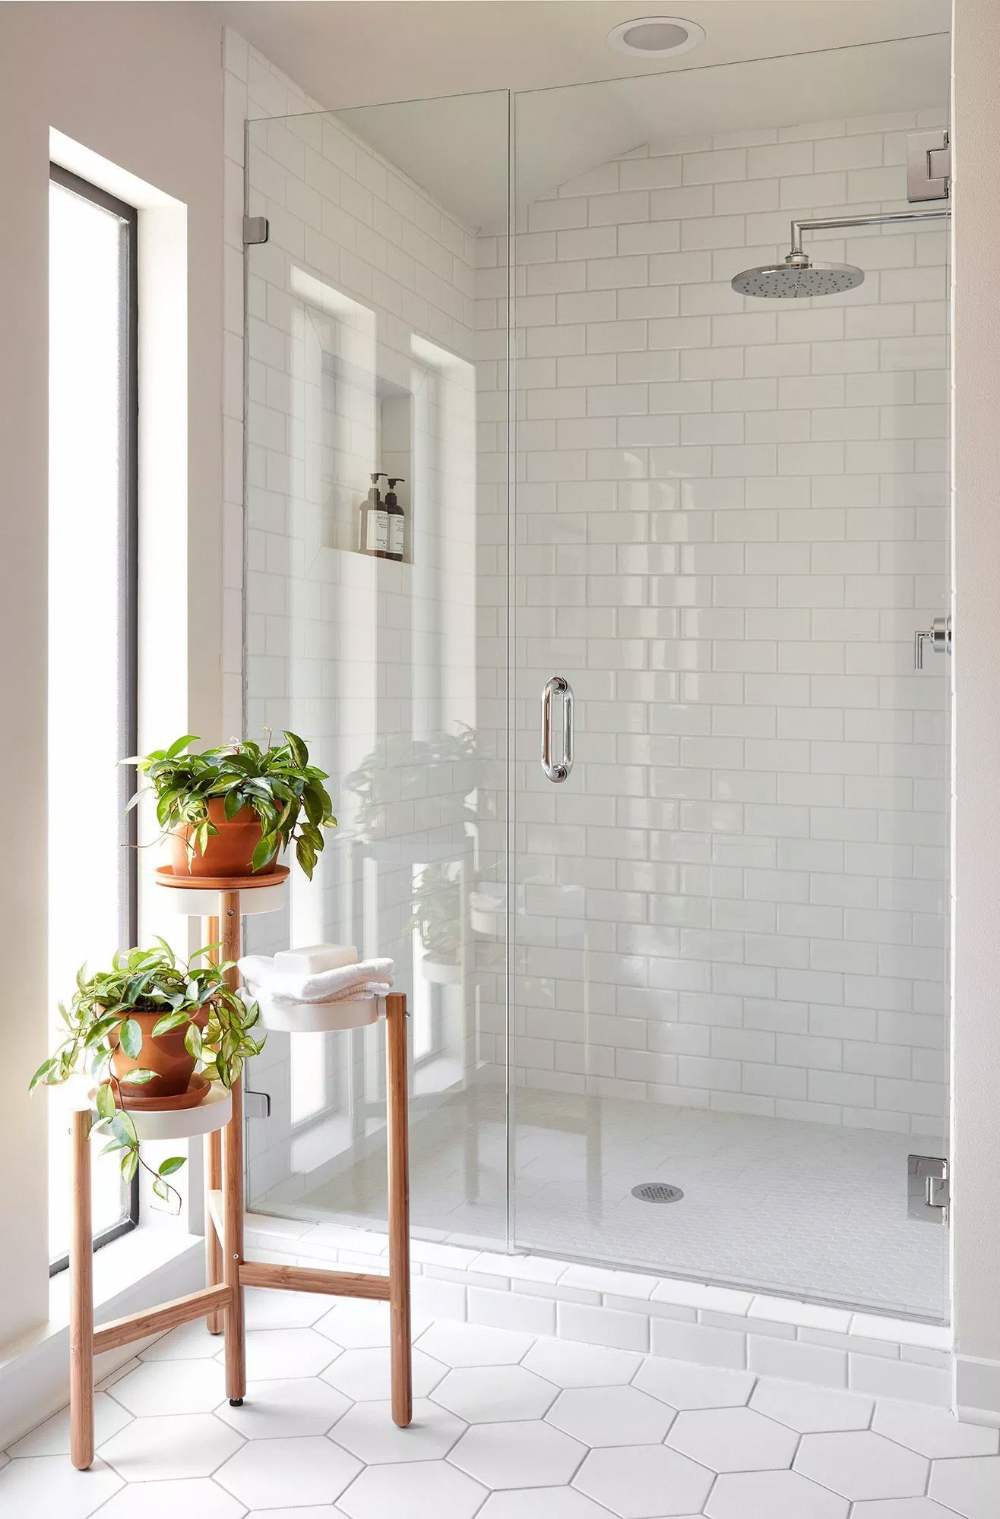 23 Modern White Bathroom Ideas Designs For 2020 Modern White Bathroom White Bathroom Designs Modern Bathroom Design